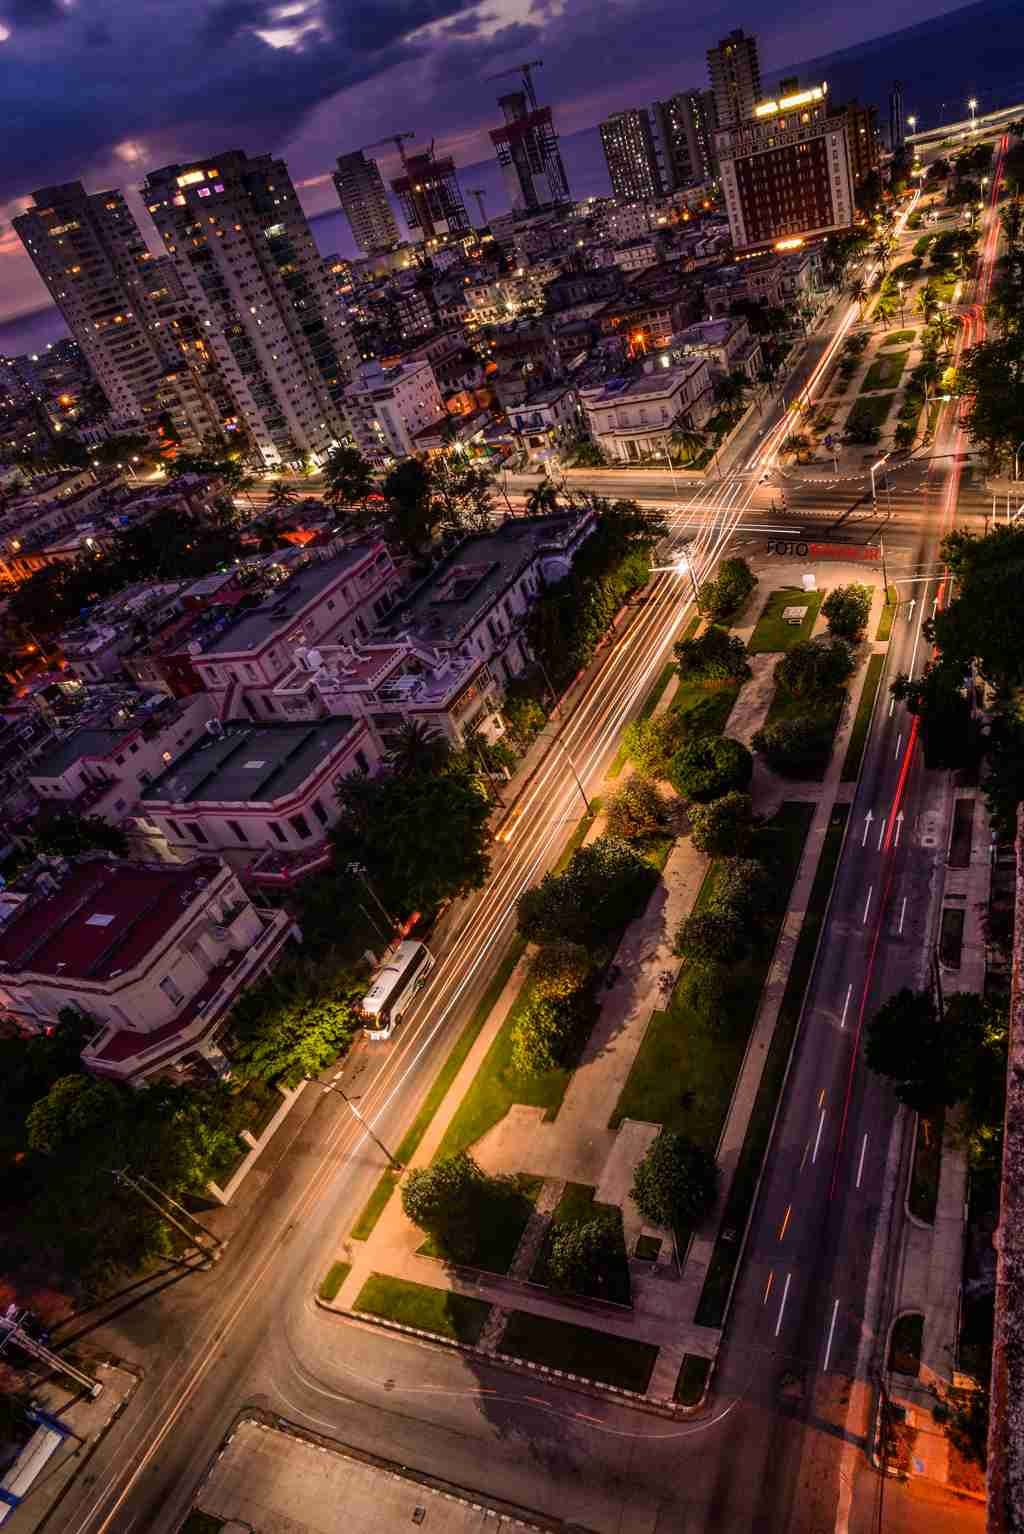 Obra: Luces de la Ciudad